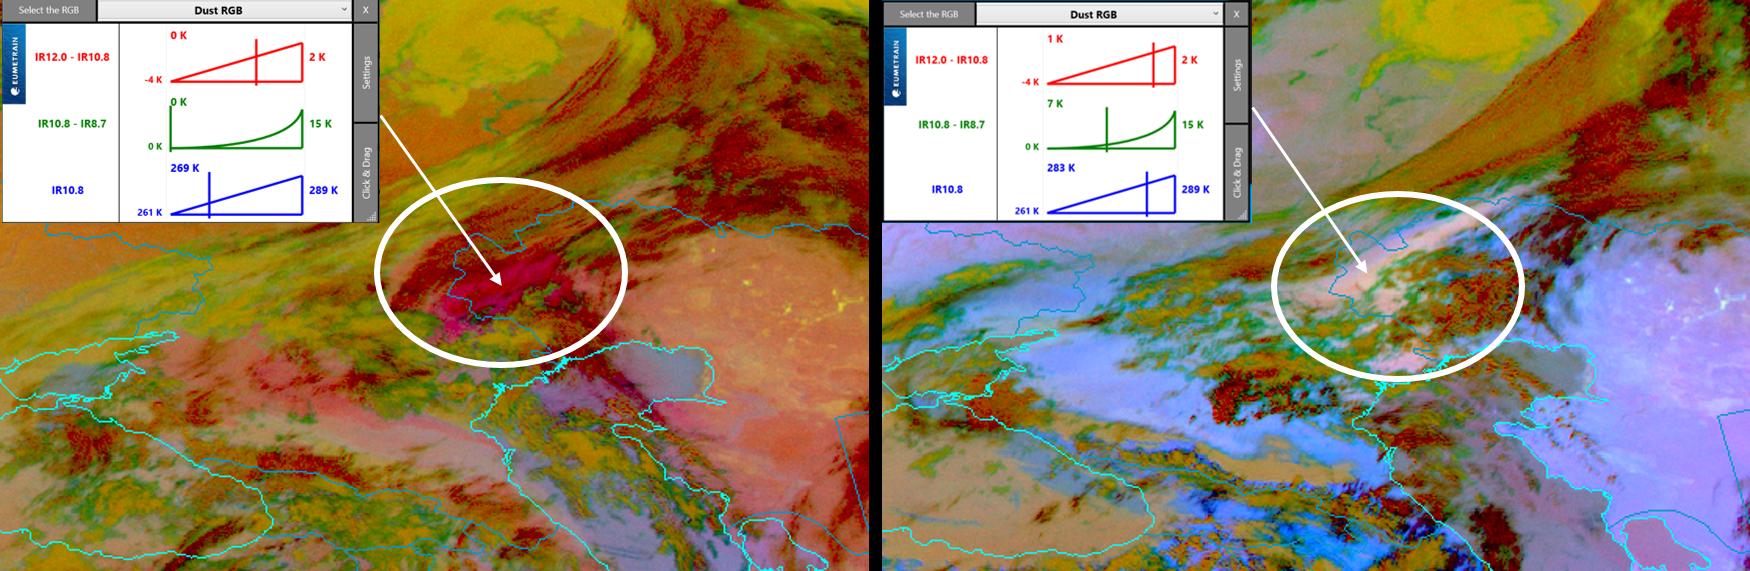 Meteosat-8 Dust RGB, 25 March, 02:00 UTC (left) and 09:00 UTC (right)